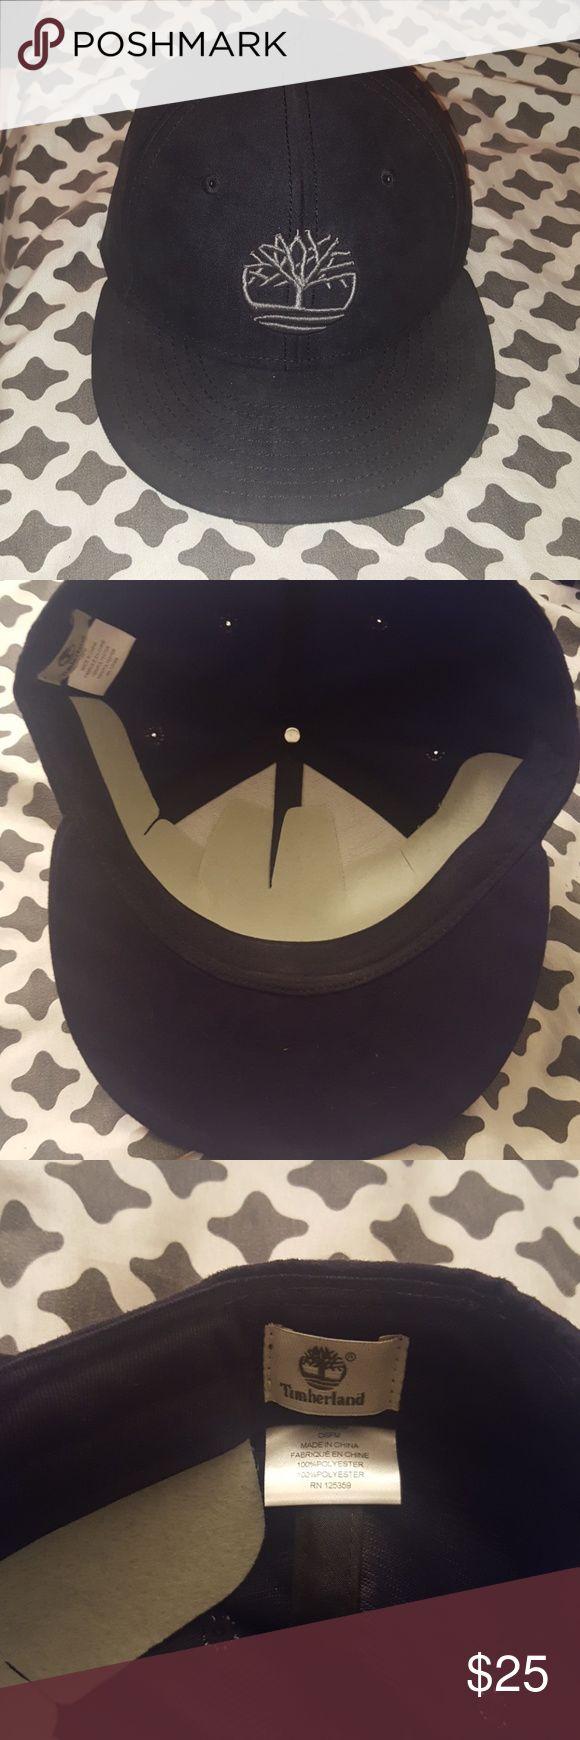 Timberland hat Black NEVER worn brand new Timberland Accessories Hats